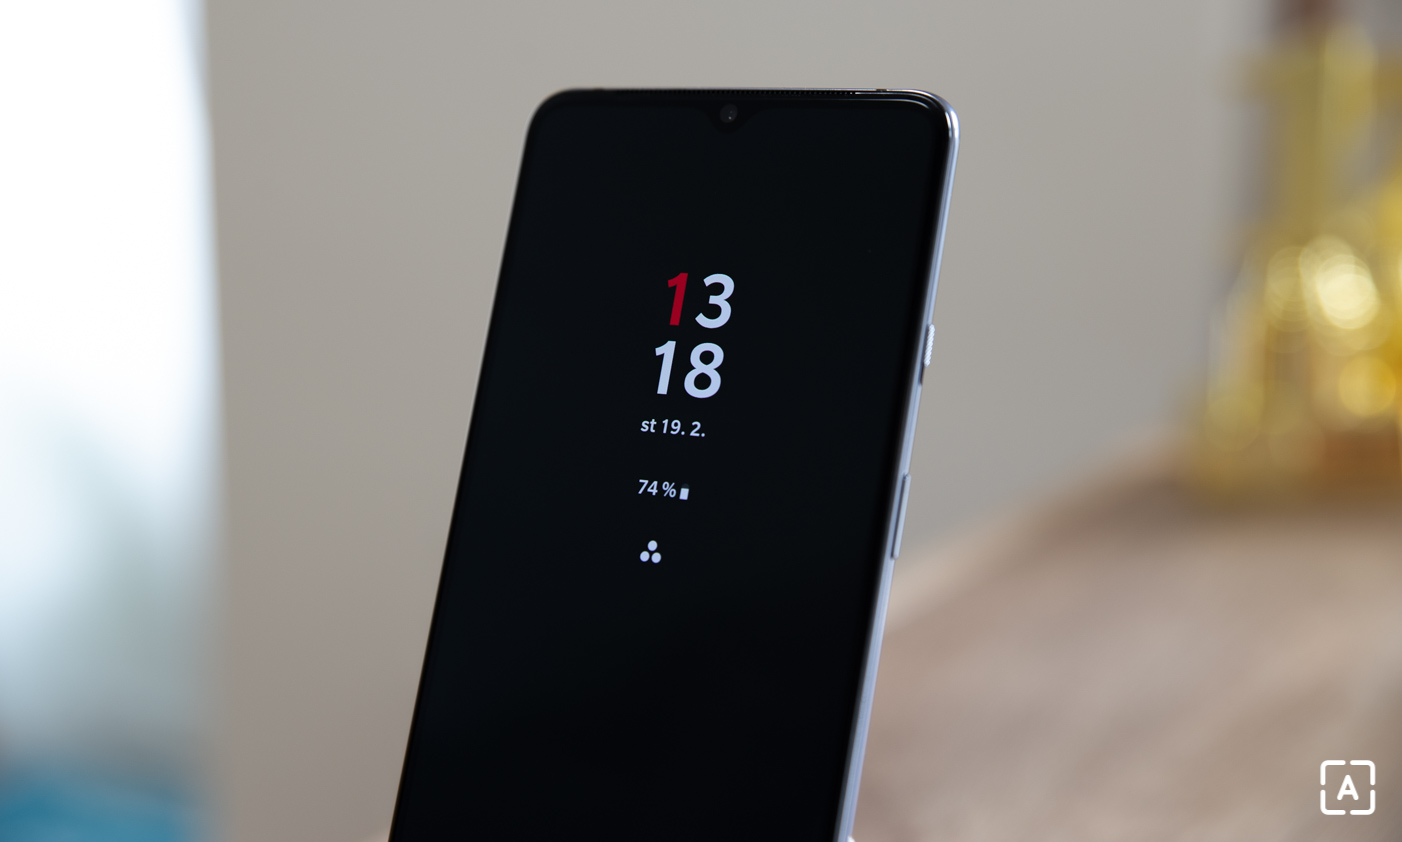 OnePlus 7T always on